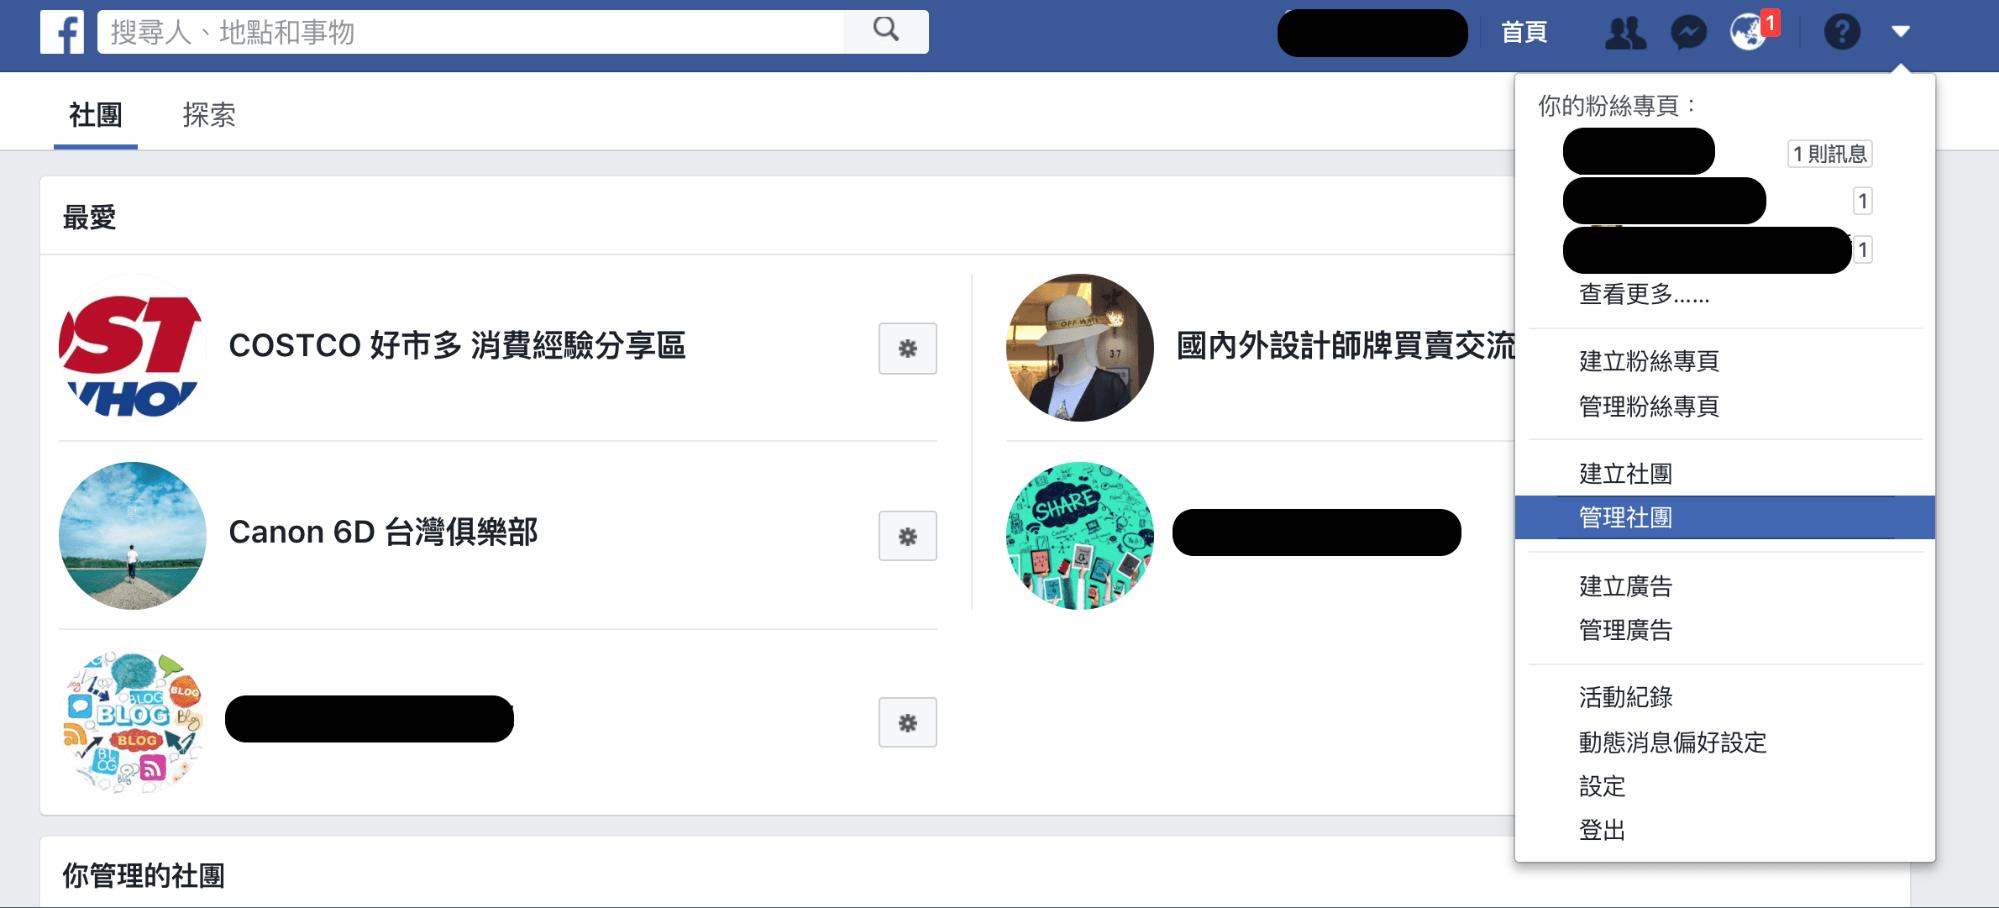 20170602150408_83